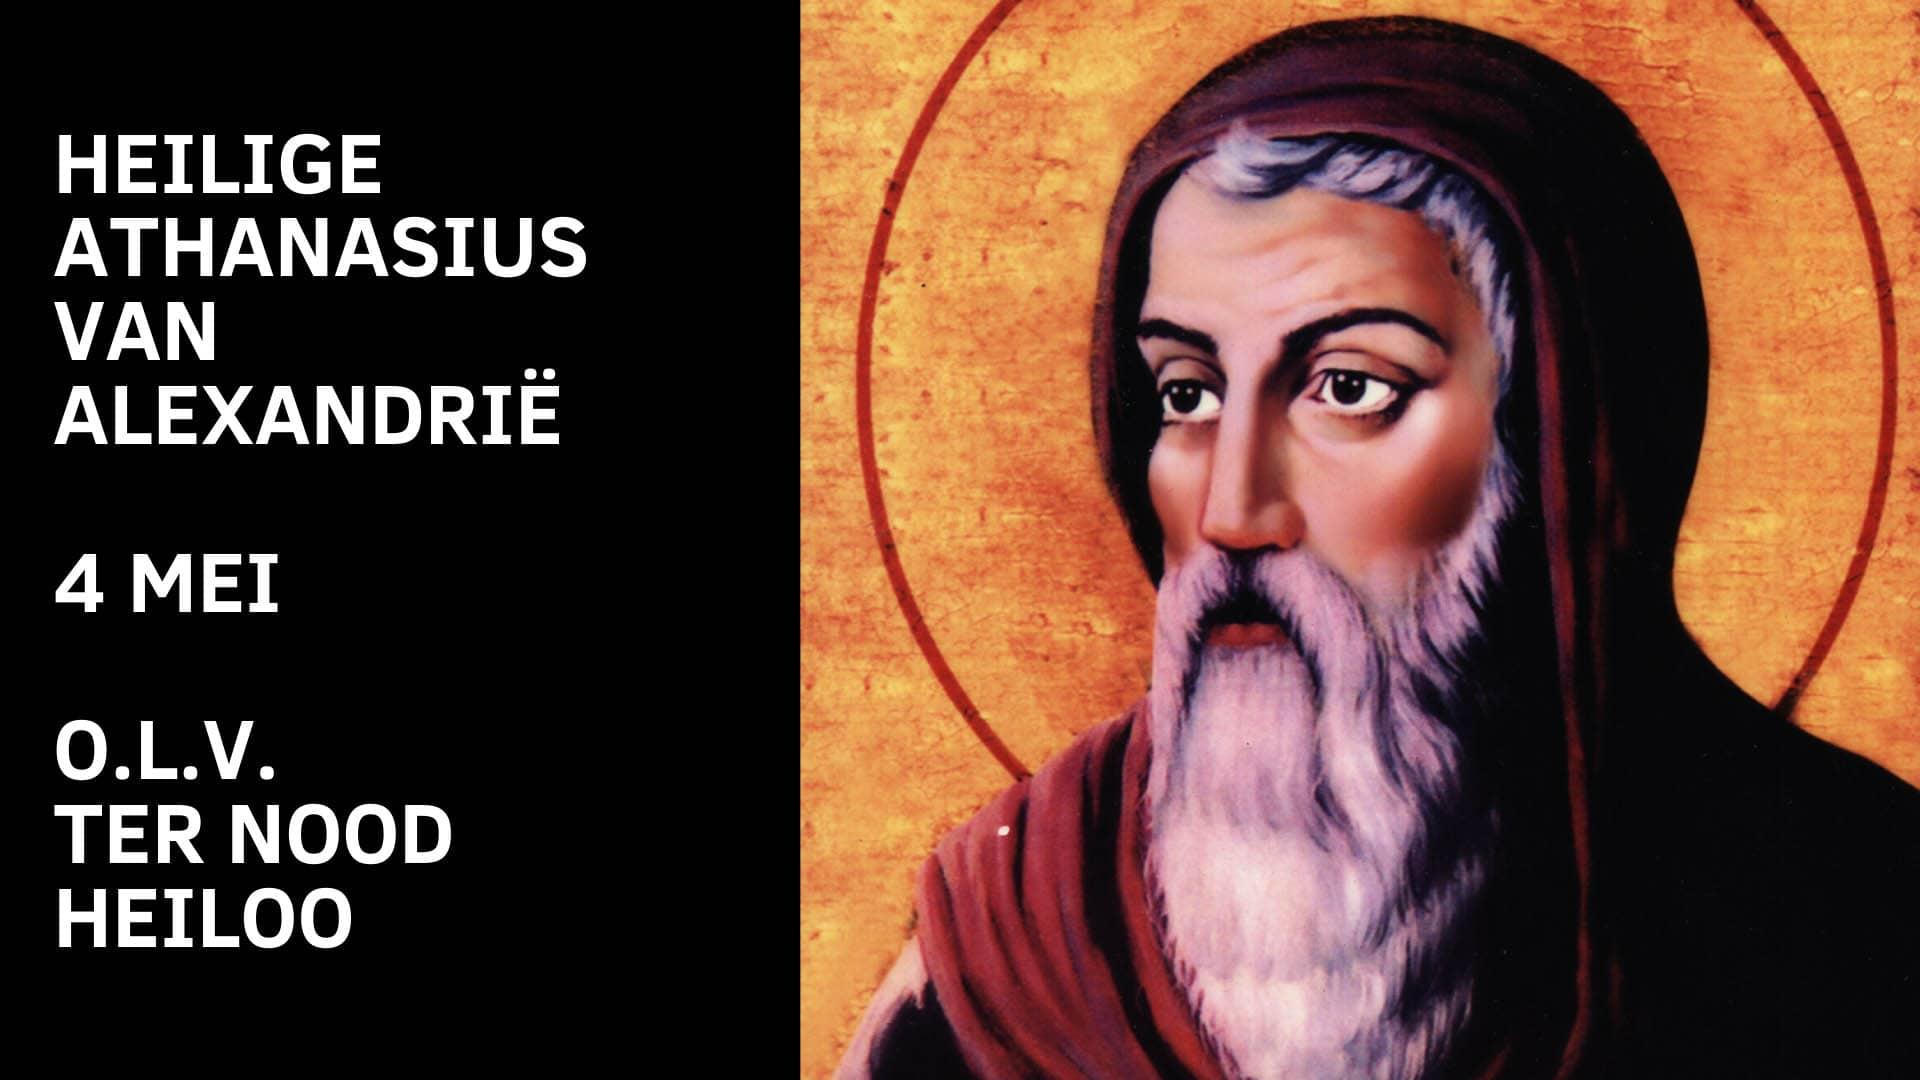 heilige-athanasius-olv-ter-nood-heiloo